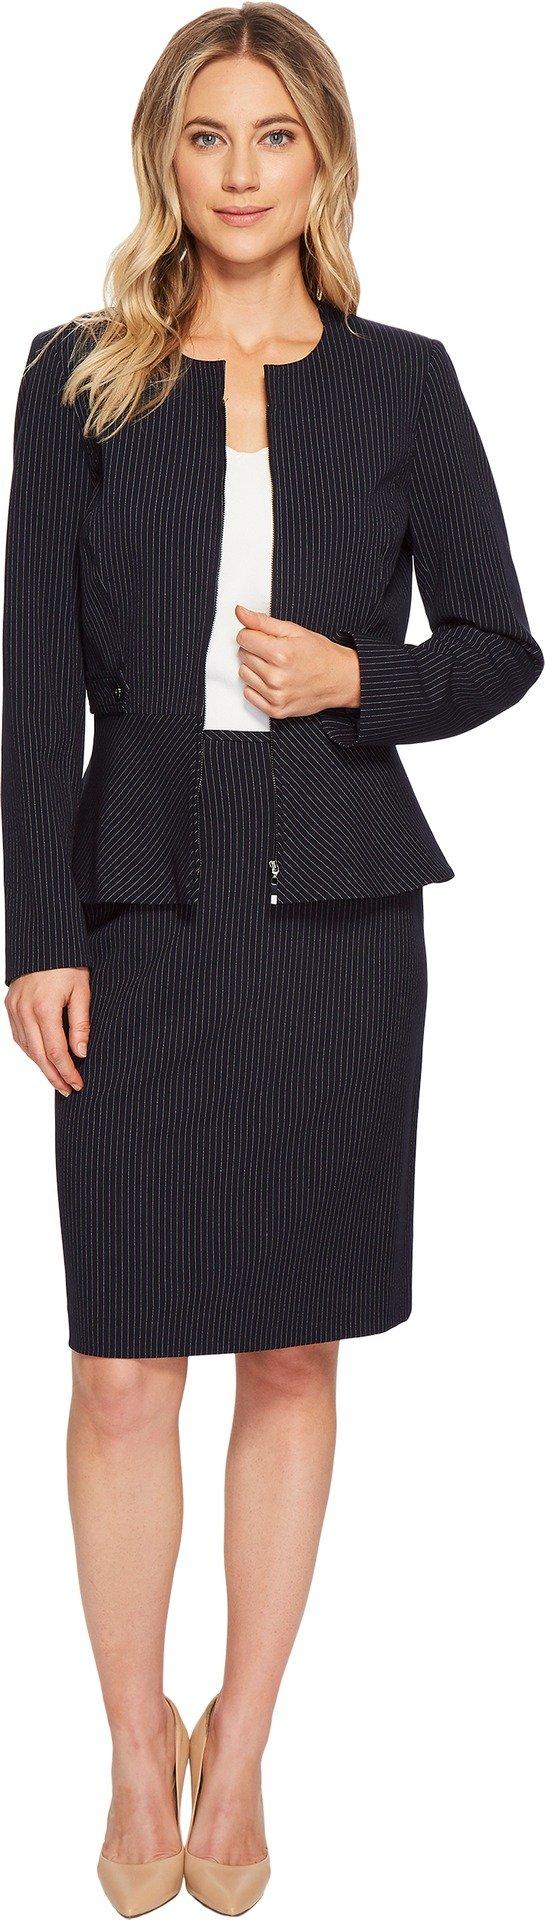 Tahari by ASL Women's Pinstripe Skirt Suit w/Waistband Tabs Navy/White 10